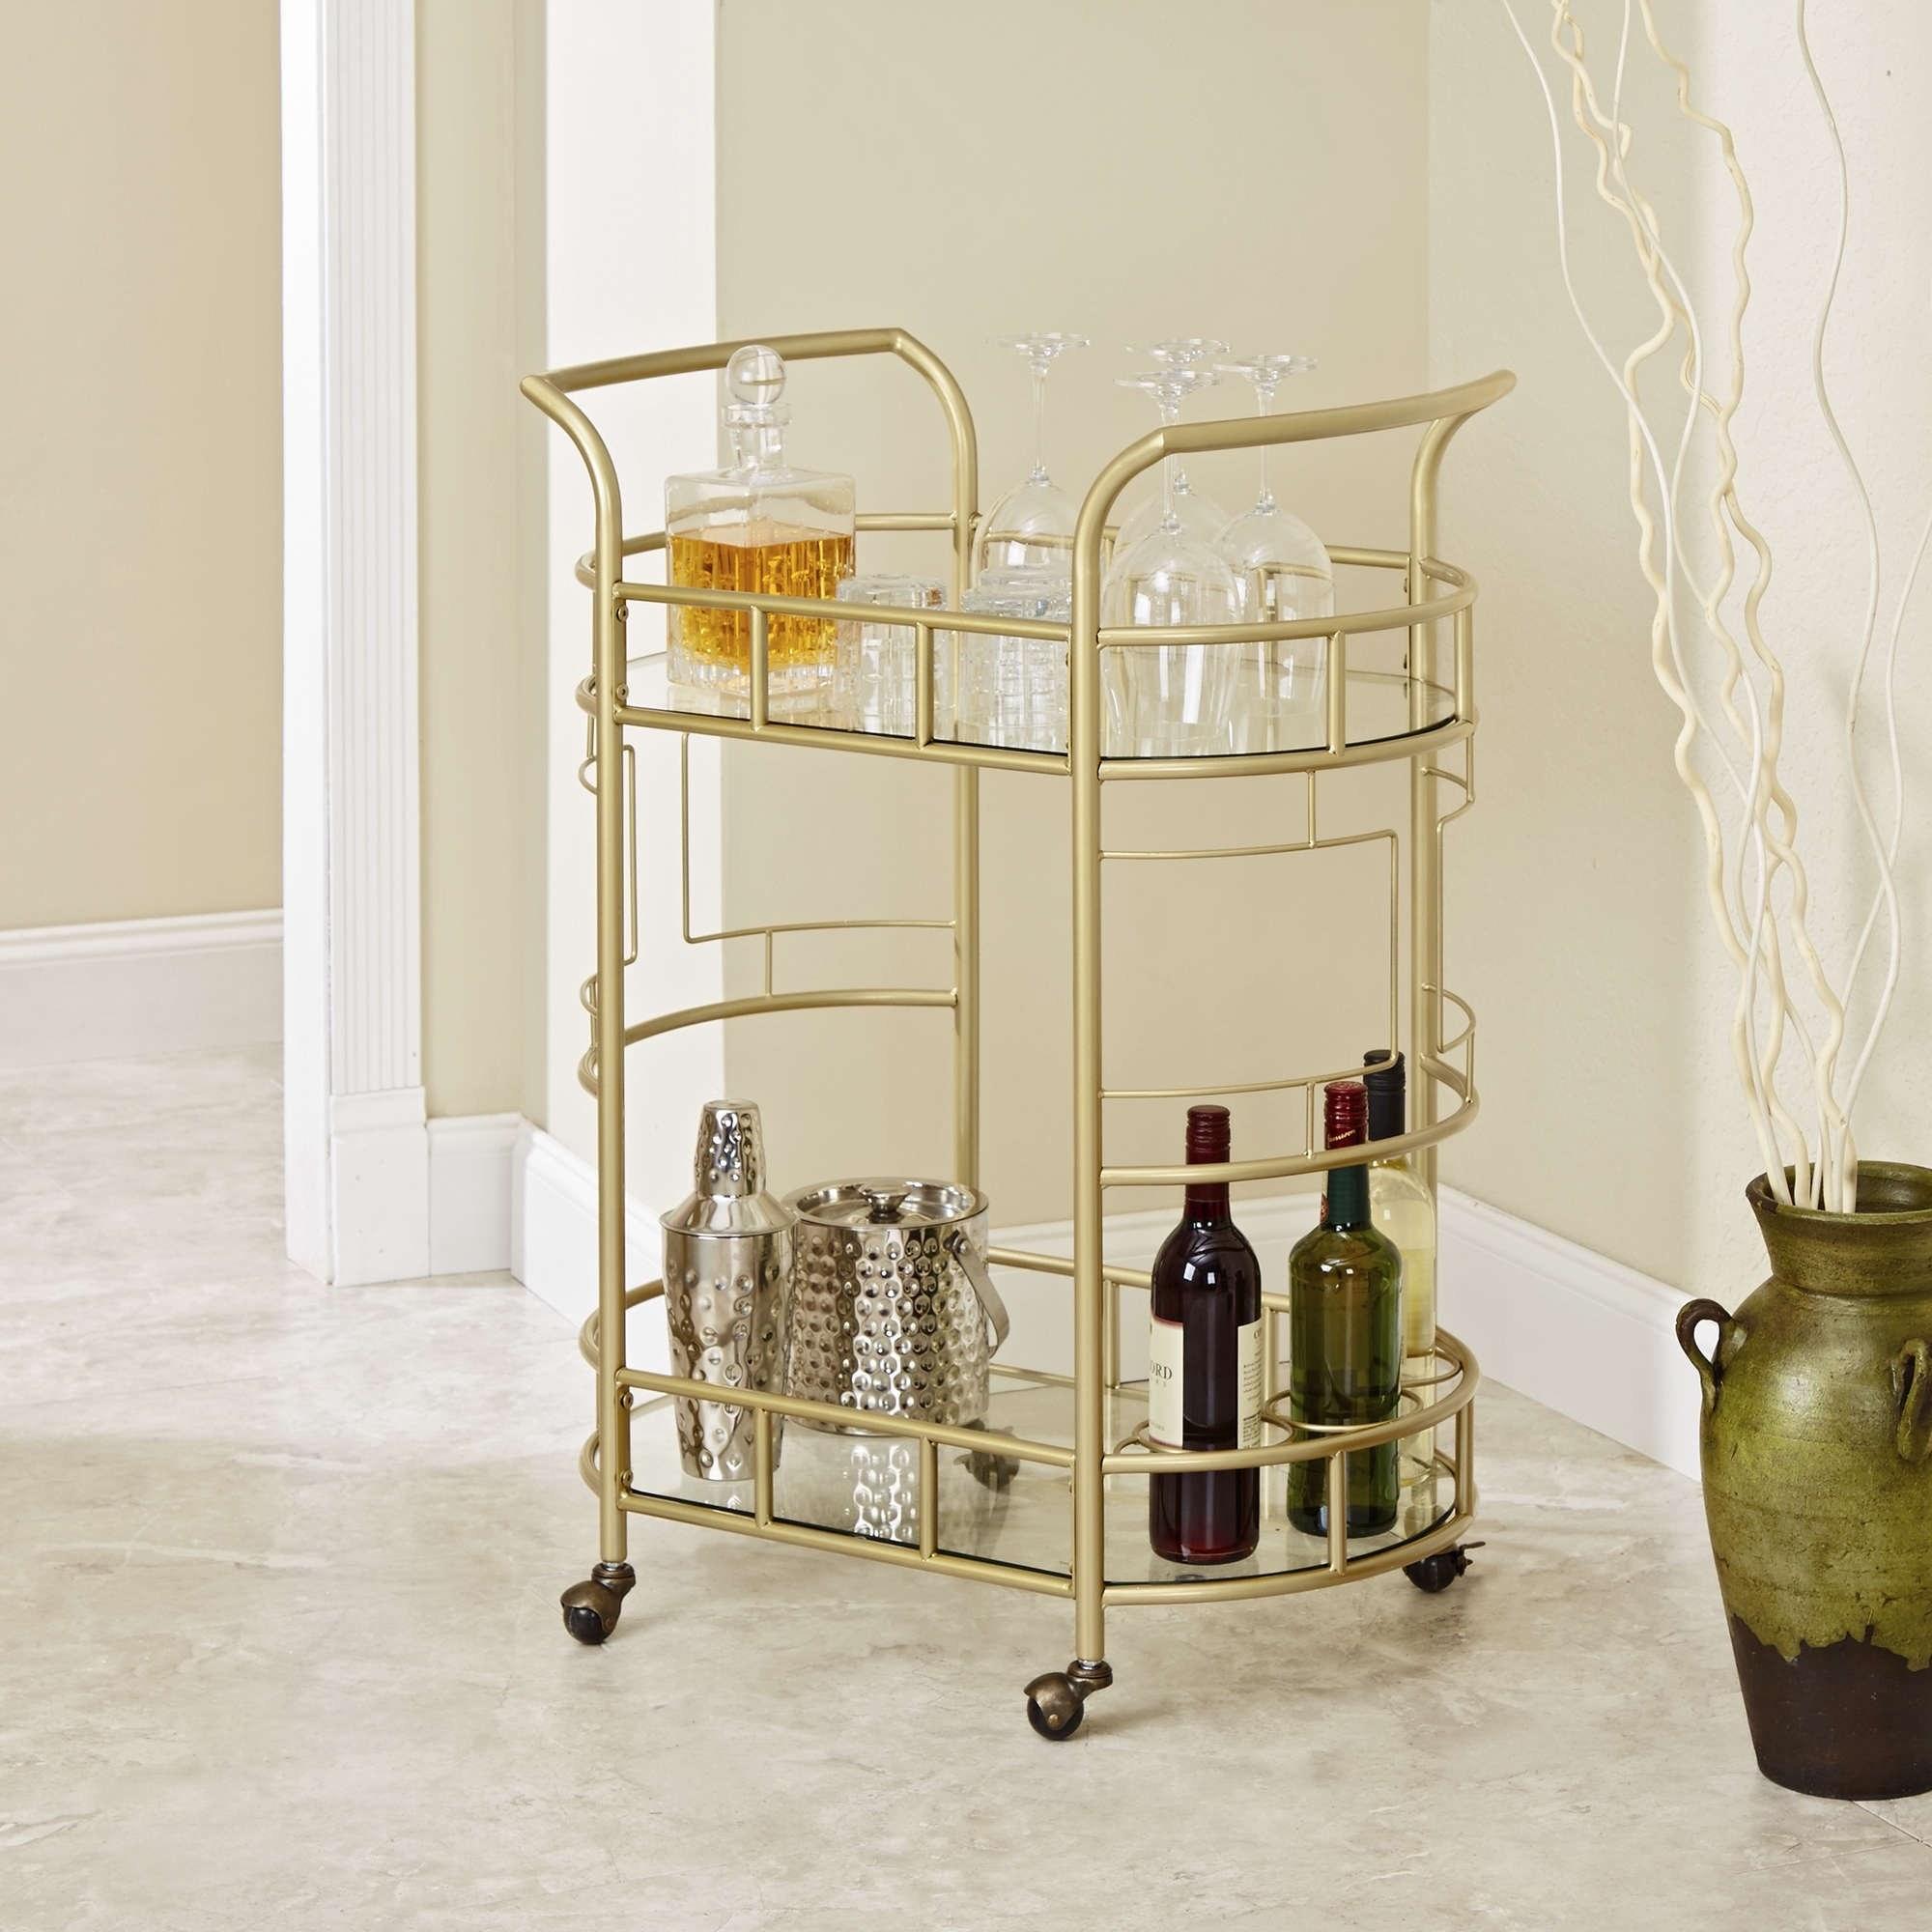 Gold bar cart with various bottles